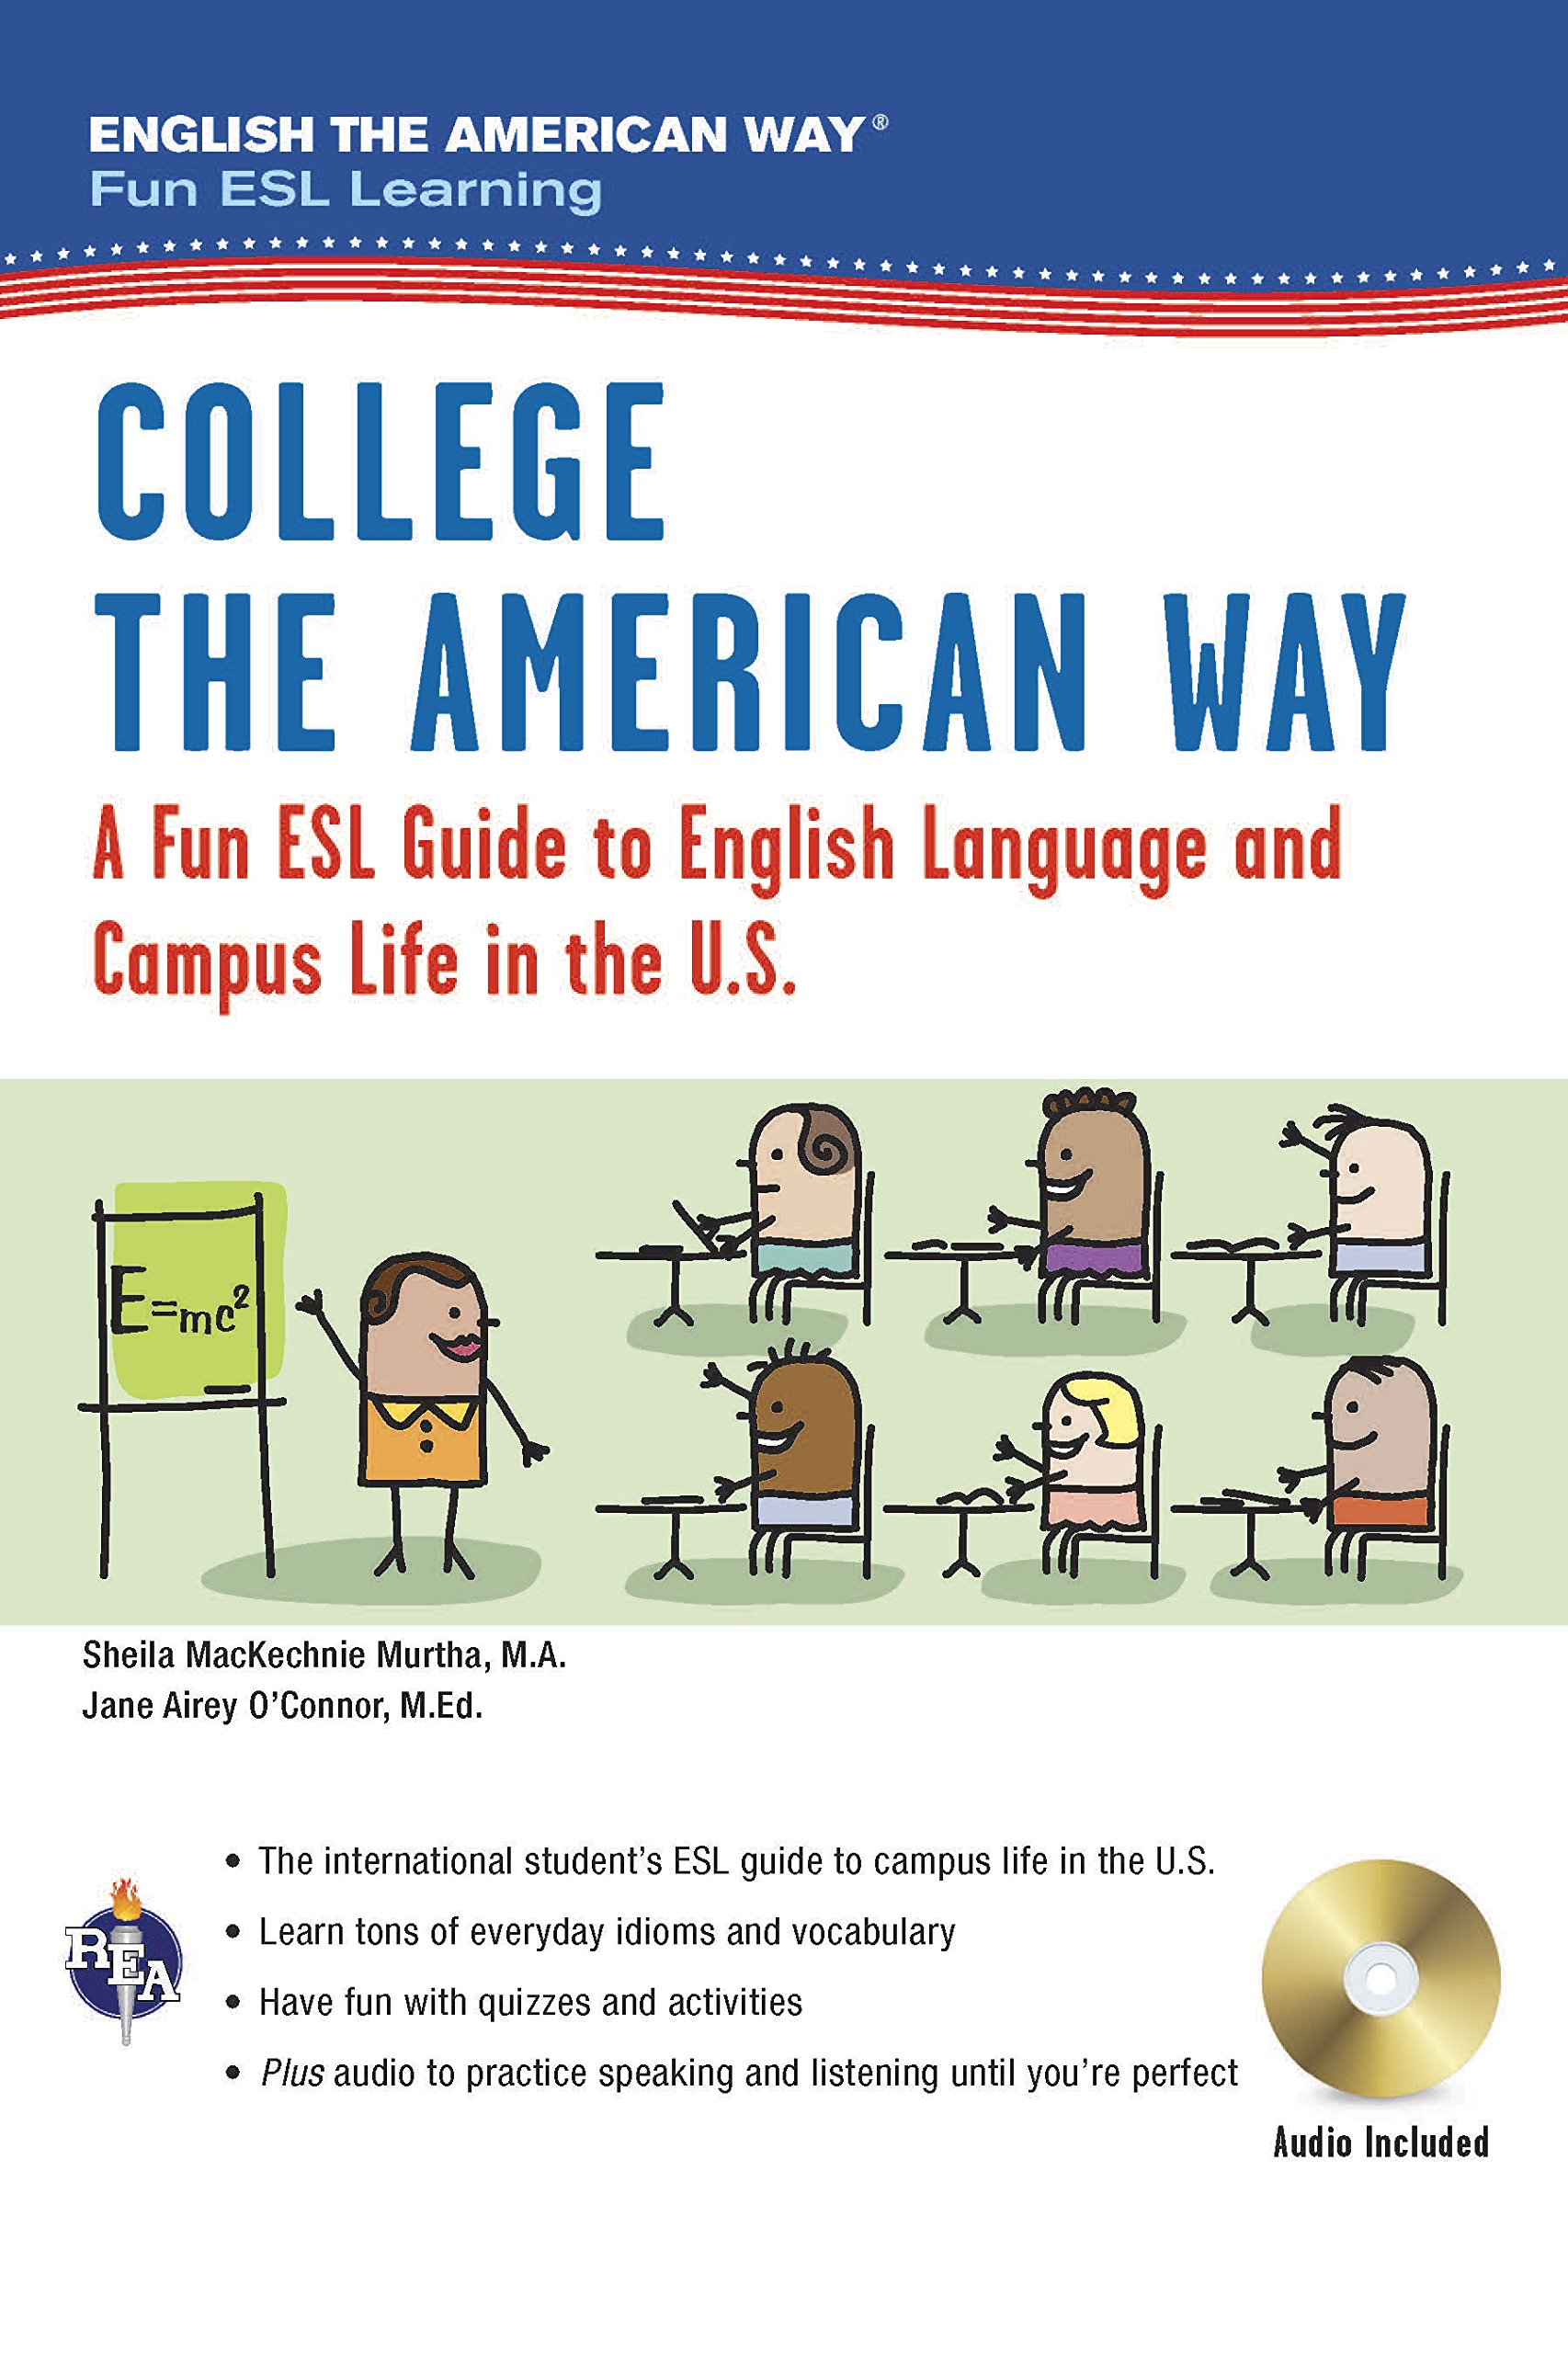 English the American Way: A Fun ESL Guide for College Students (Book + Audio) (English the American Way: Fun ESL Learning)